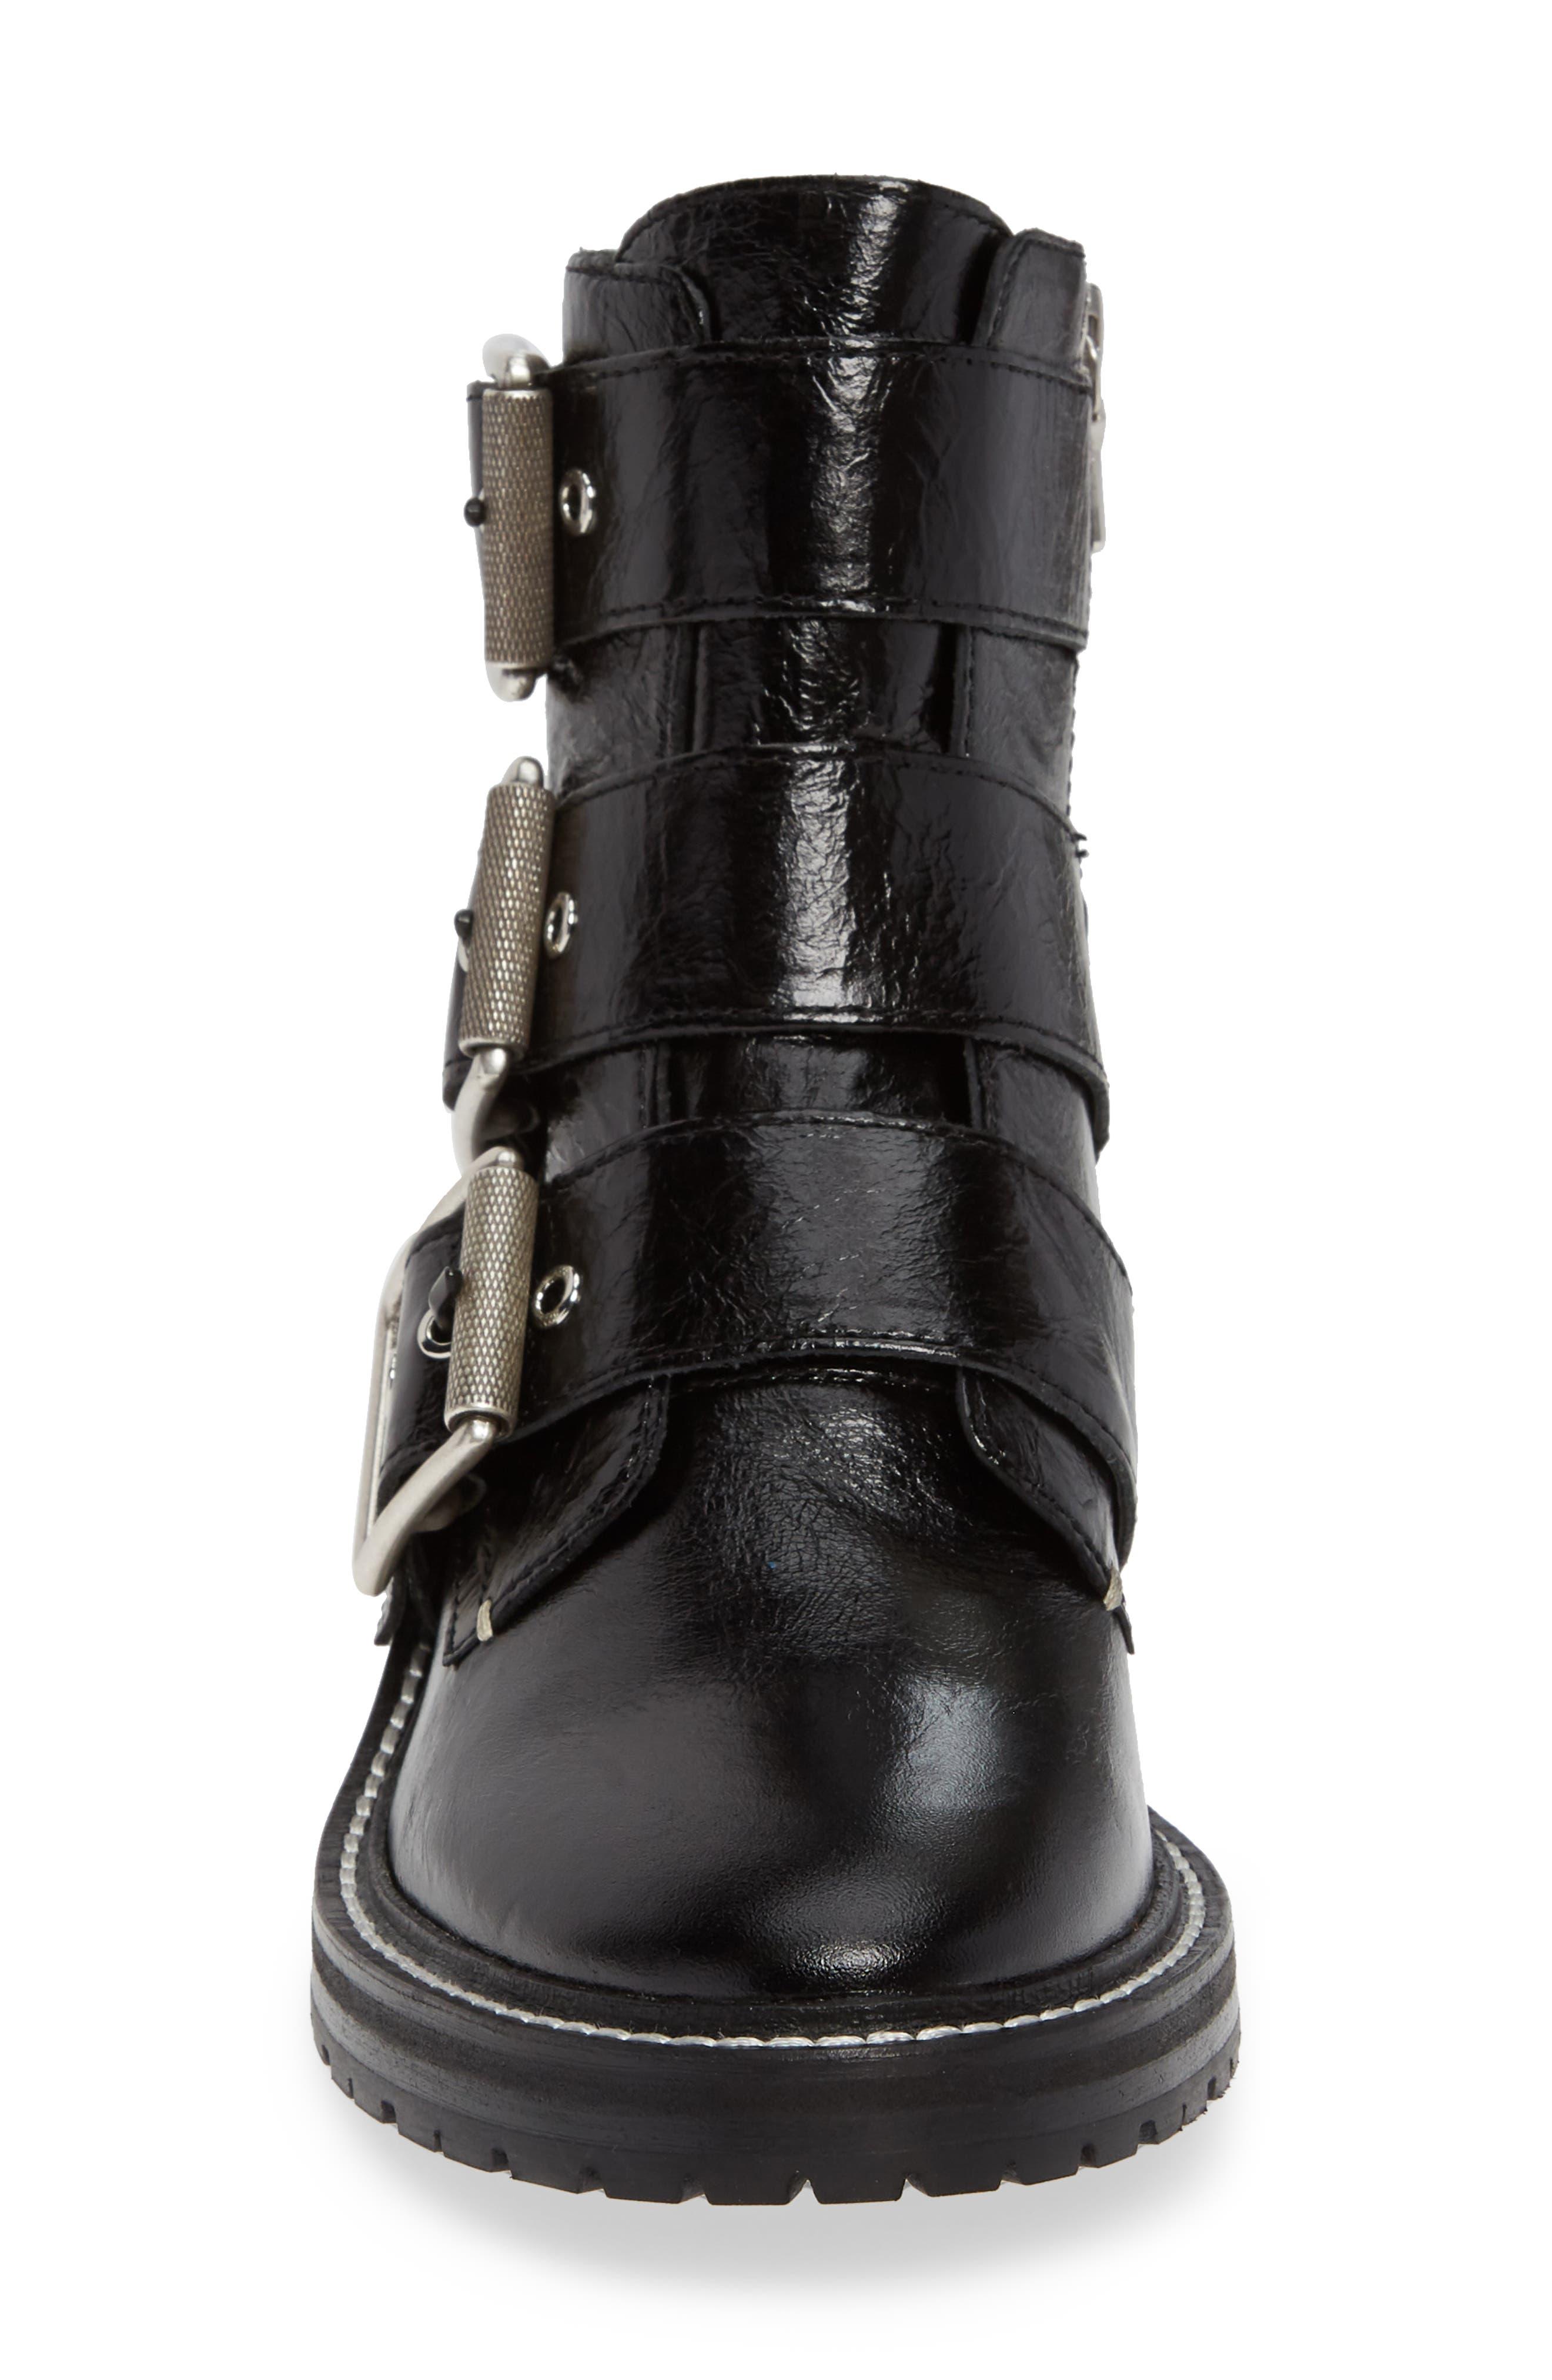 RAG & BONE, Cannon Buckle Moto Boot, Alternate thumbnail 4, color, BLACK